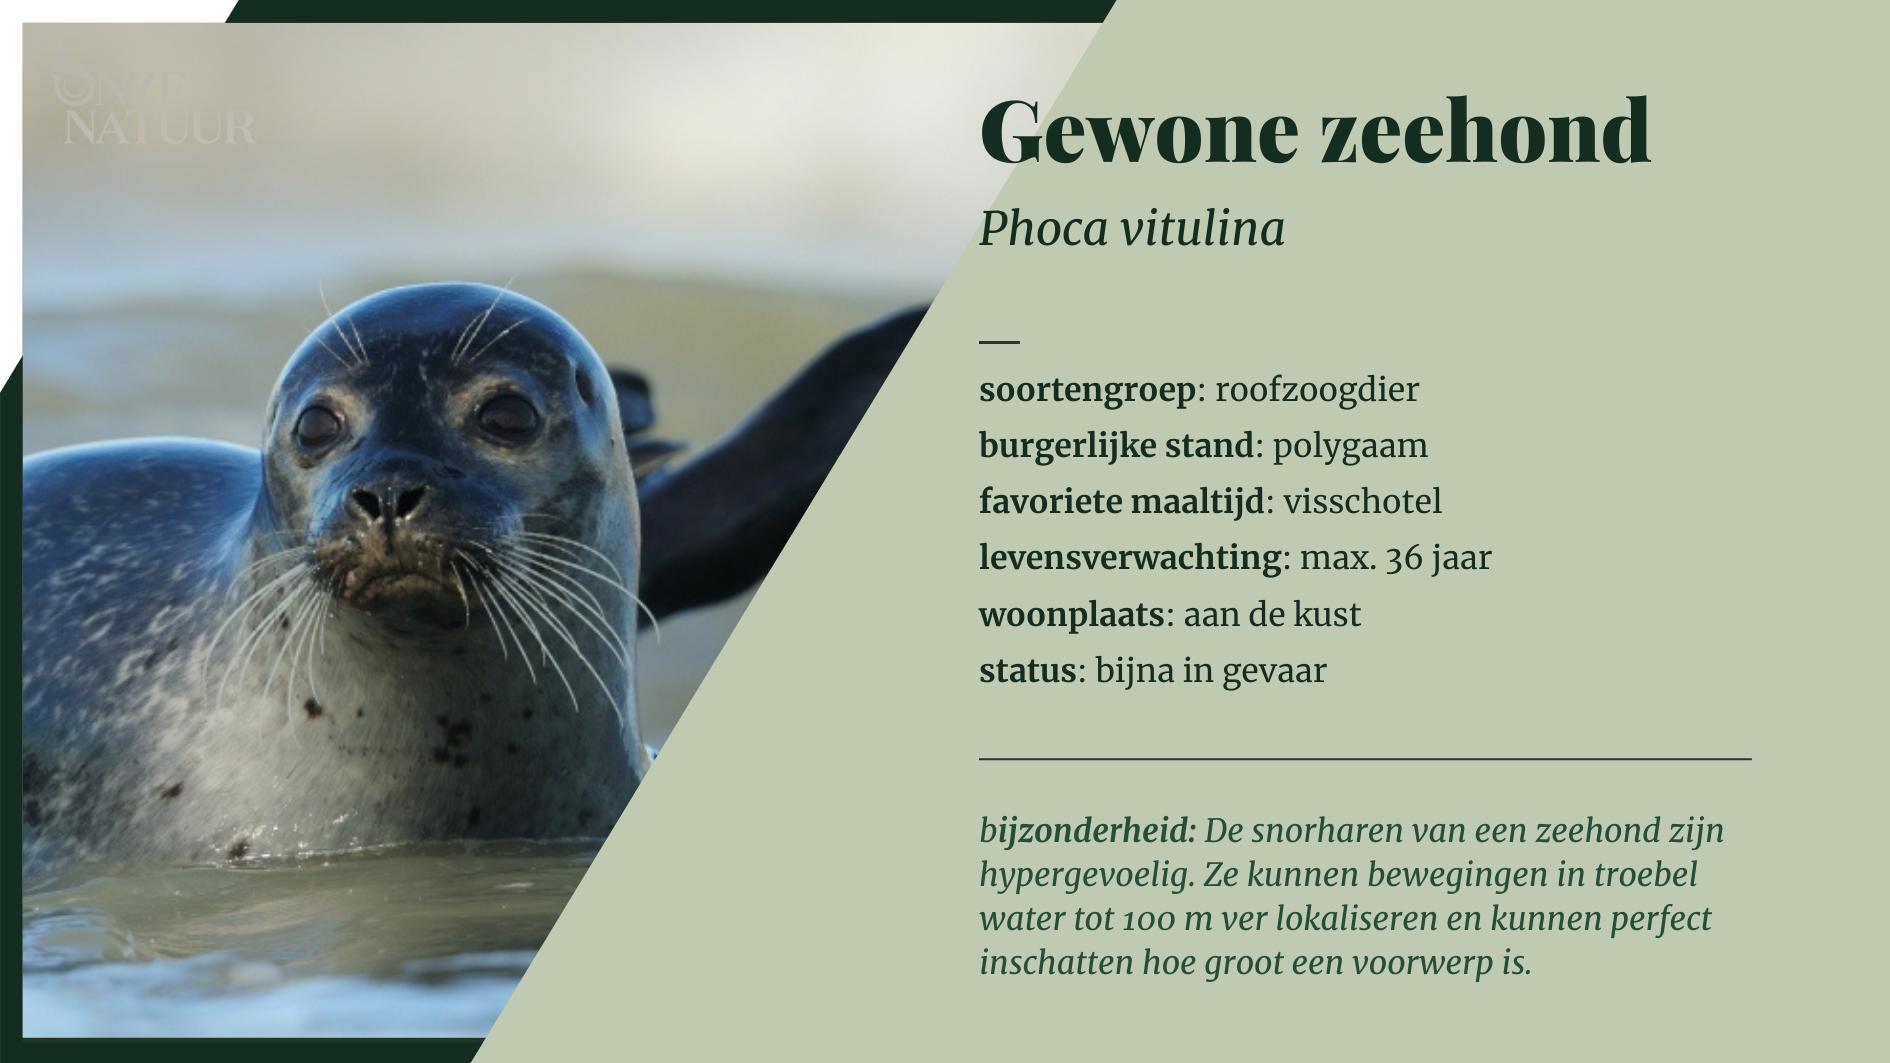 Alle info verzameld over de gewone zeehond